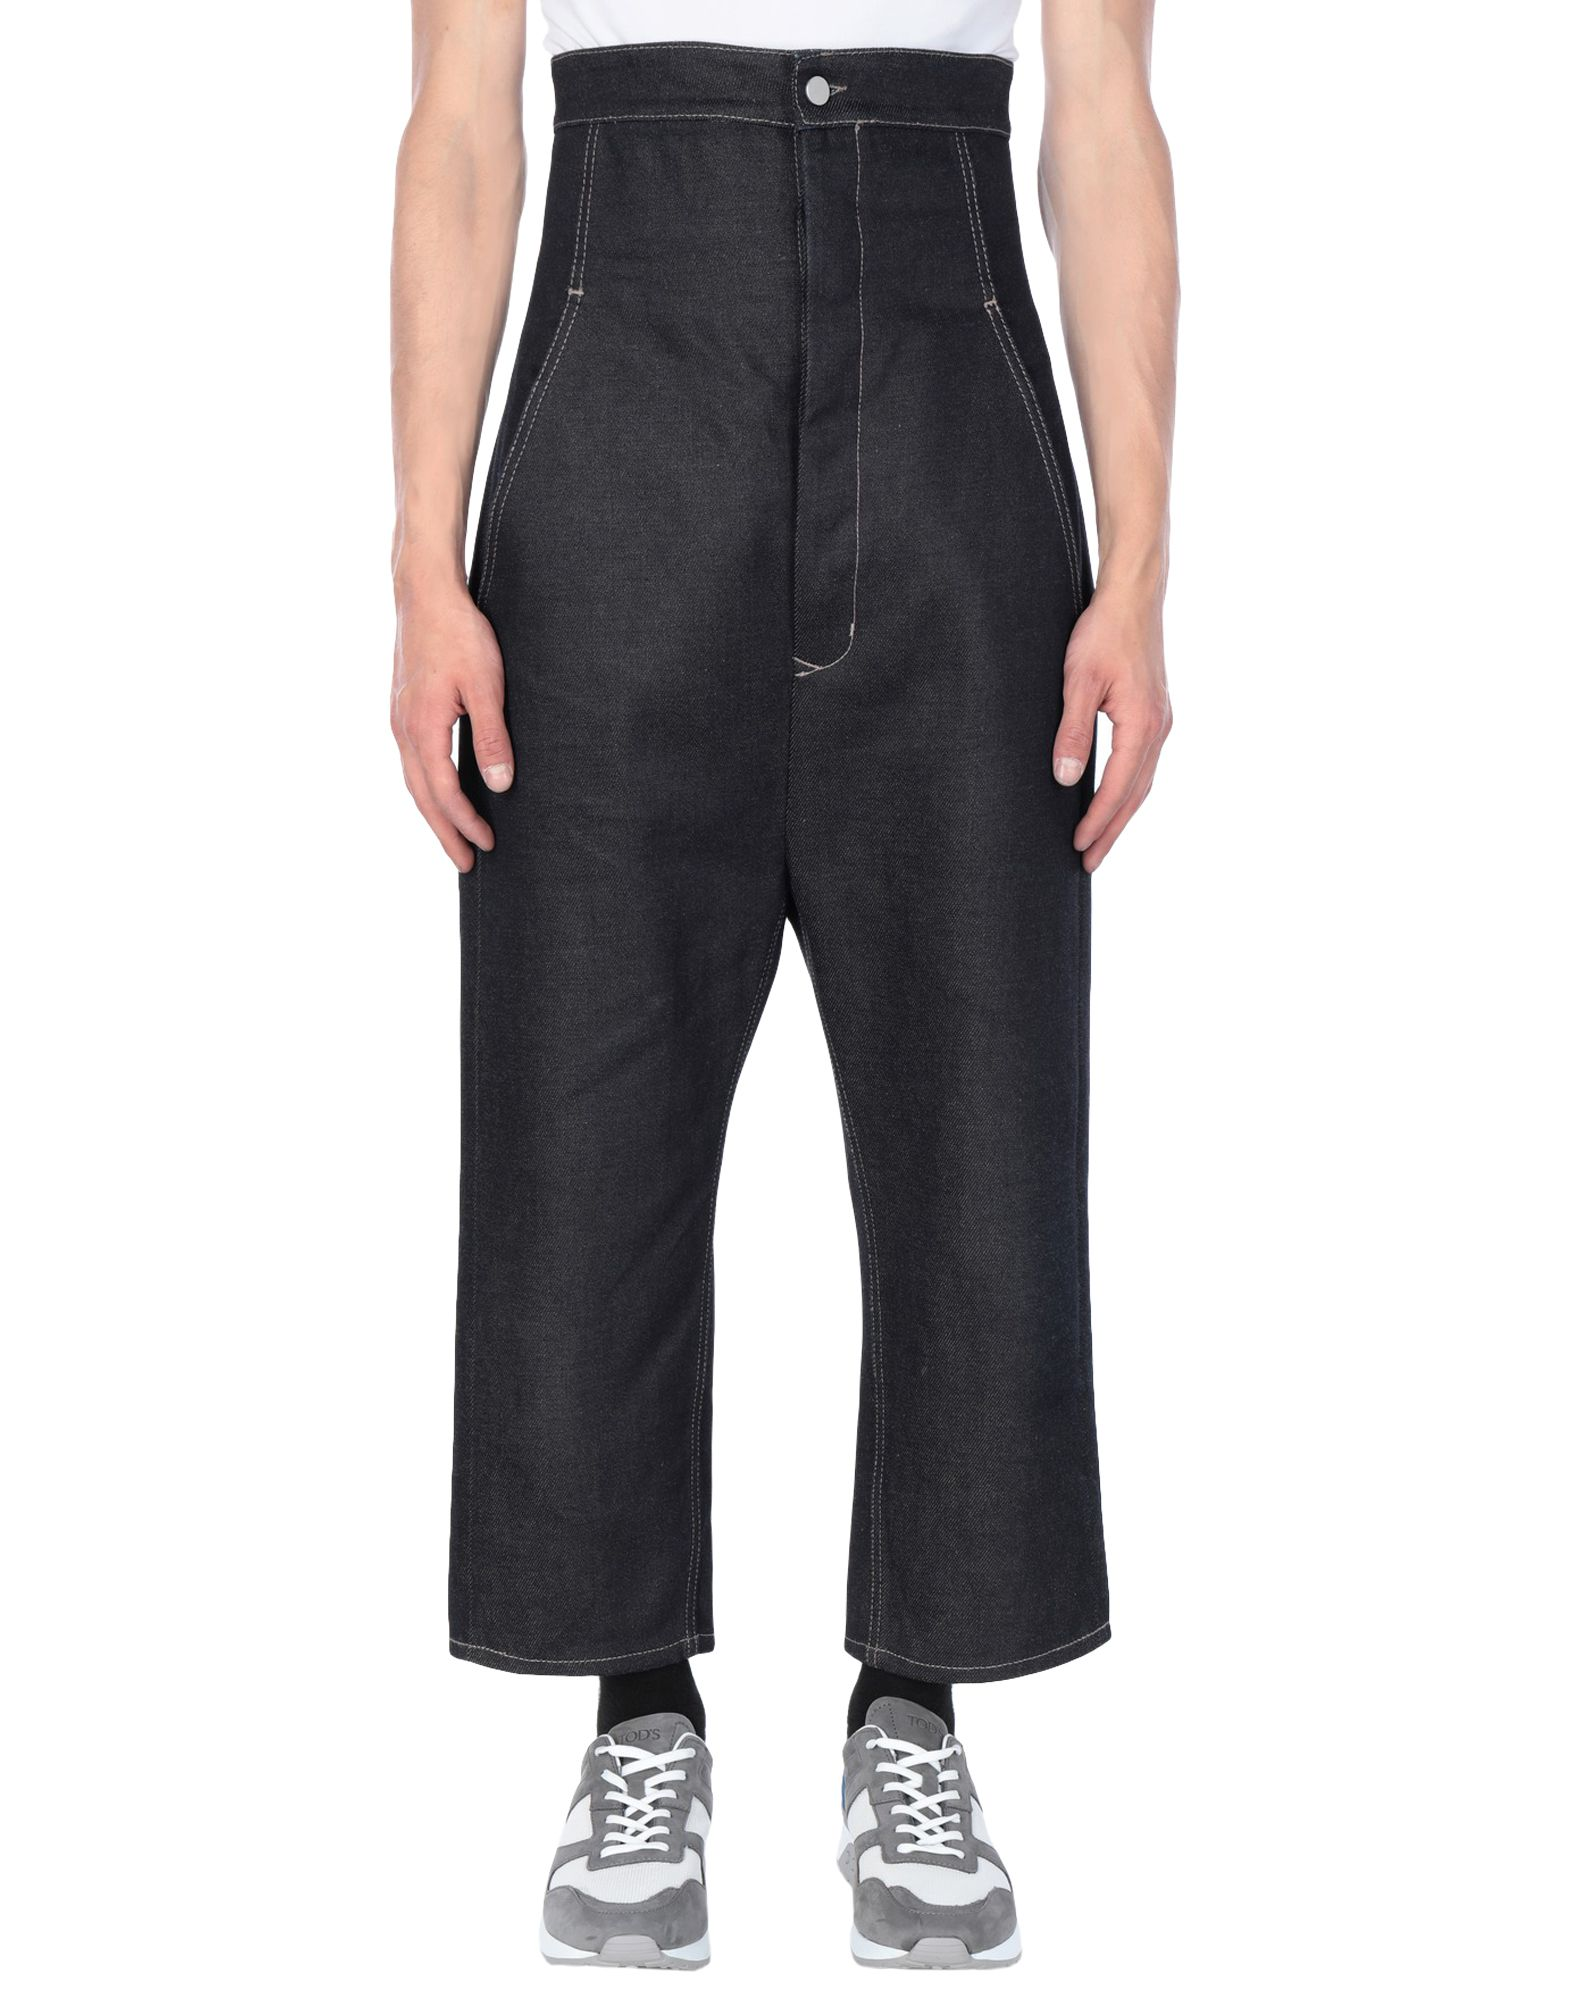 RICK OWENS Jeans. denim, no appliqués, solid color, dark wash, high waisted, front closure, button closing, multipockets. 100% Cotton